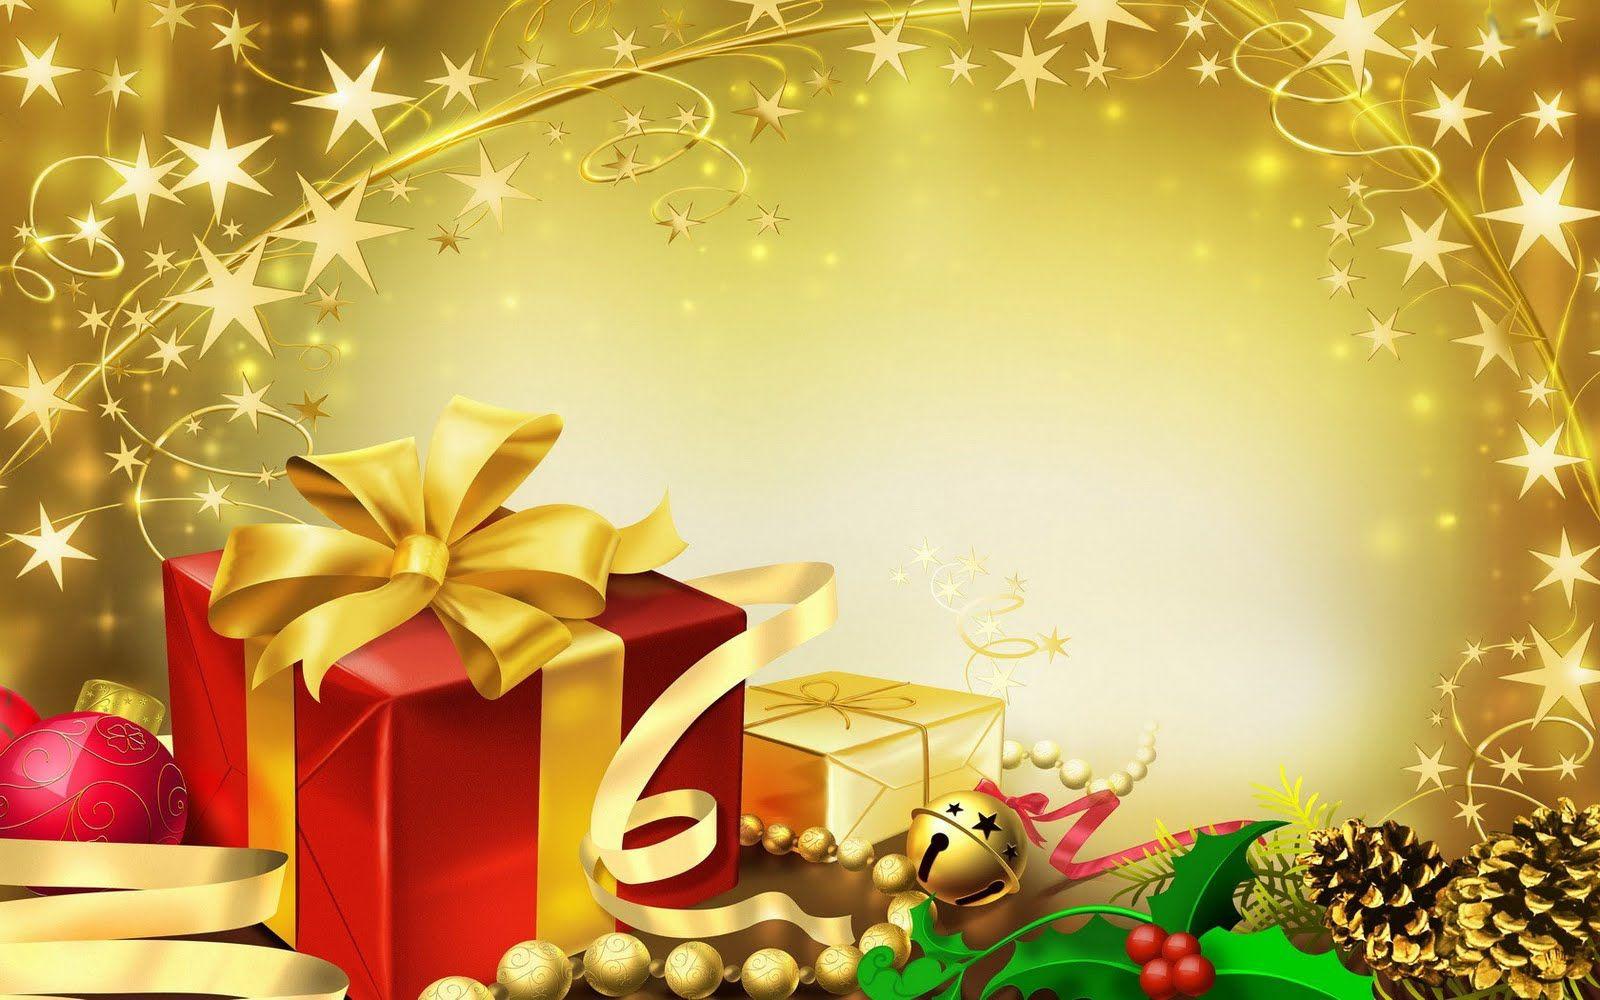 Free Christmas Wallpaper Download Рождественские обои